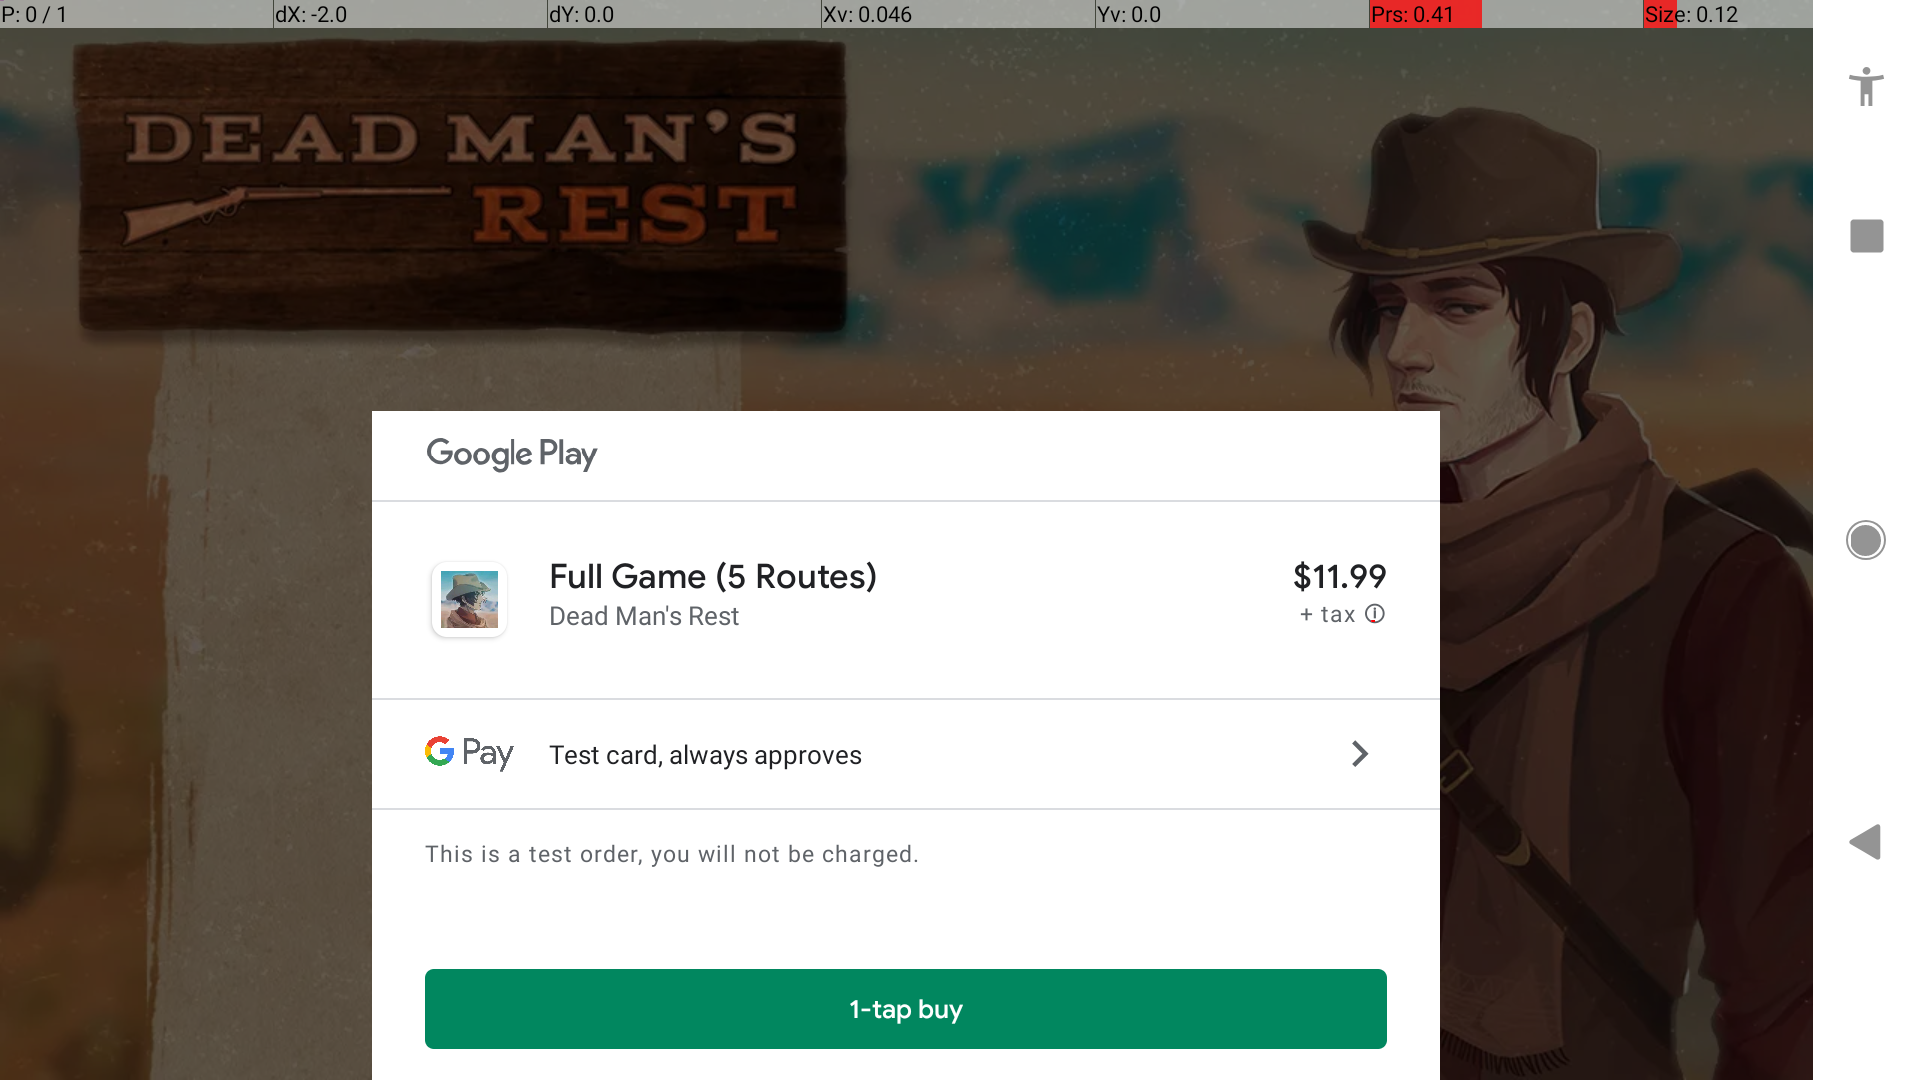 google play purchase screen pop up with dmr main menu visible